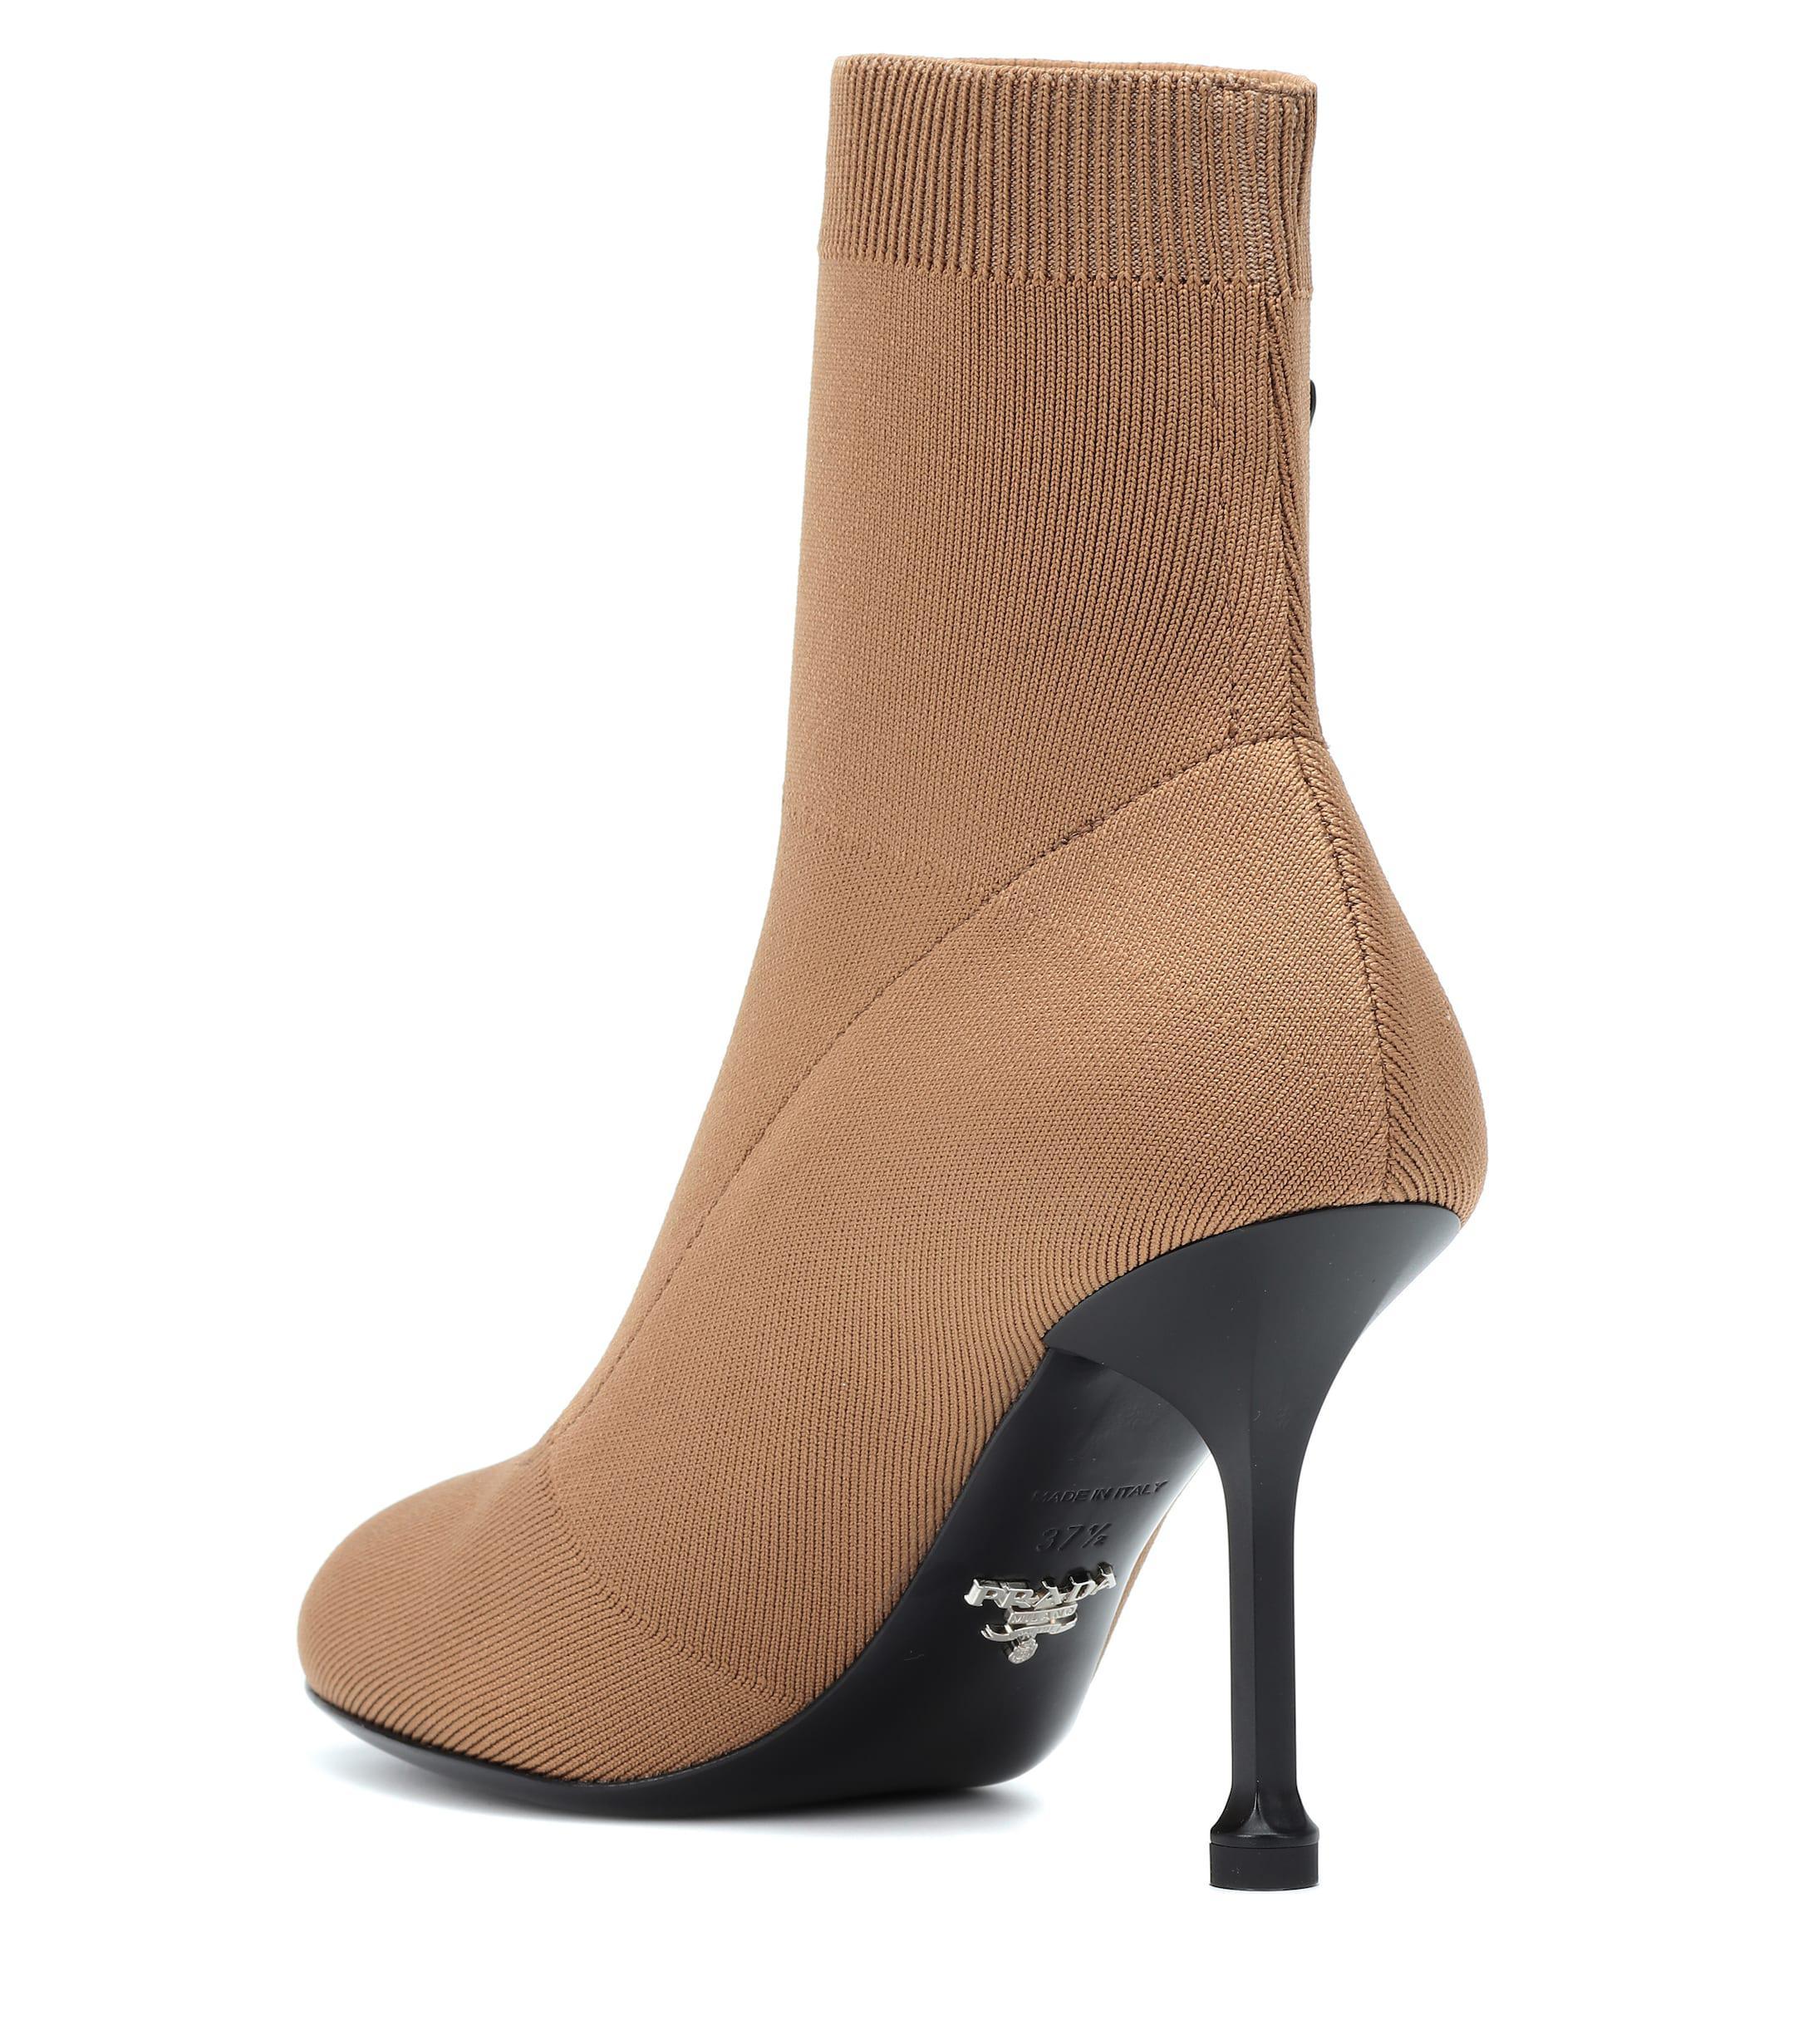 wholesale dealer 2c7d7 336fa Stretch Strick Braun Aus Damen In Ankle Boots c4jL5ARS3q